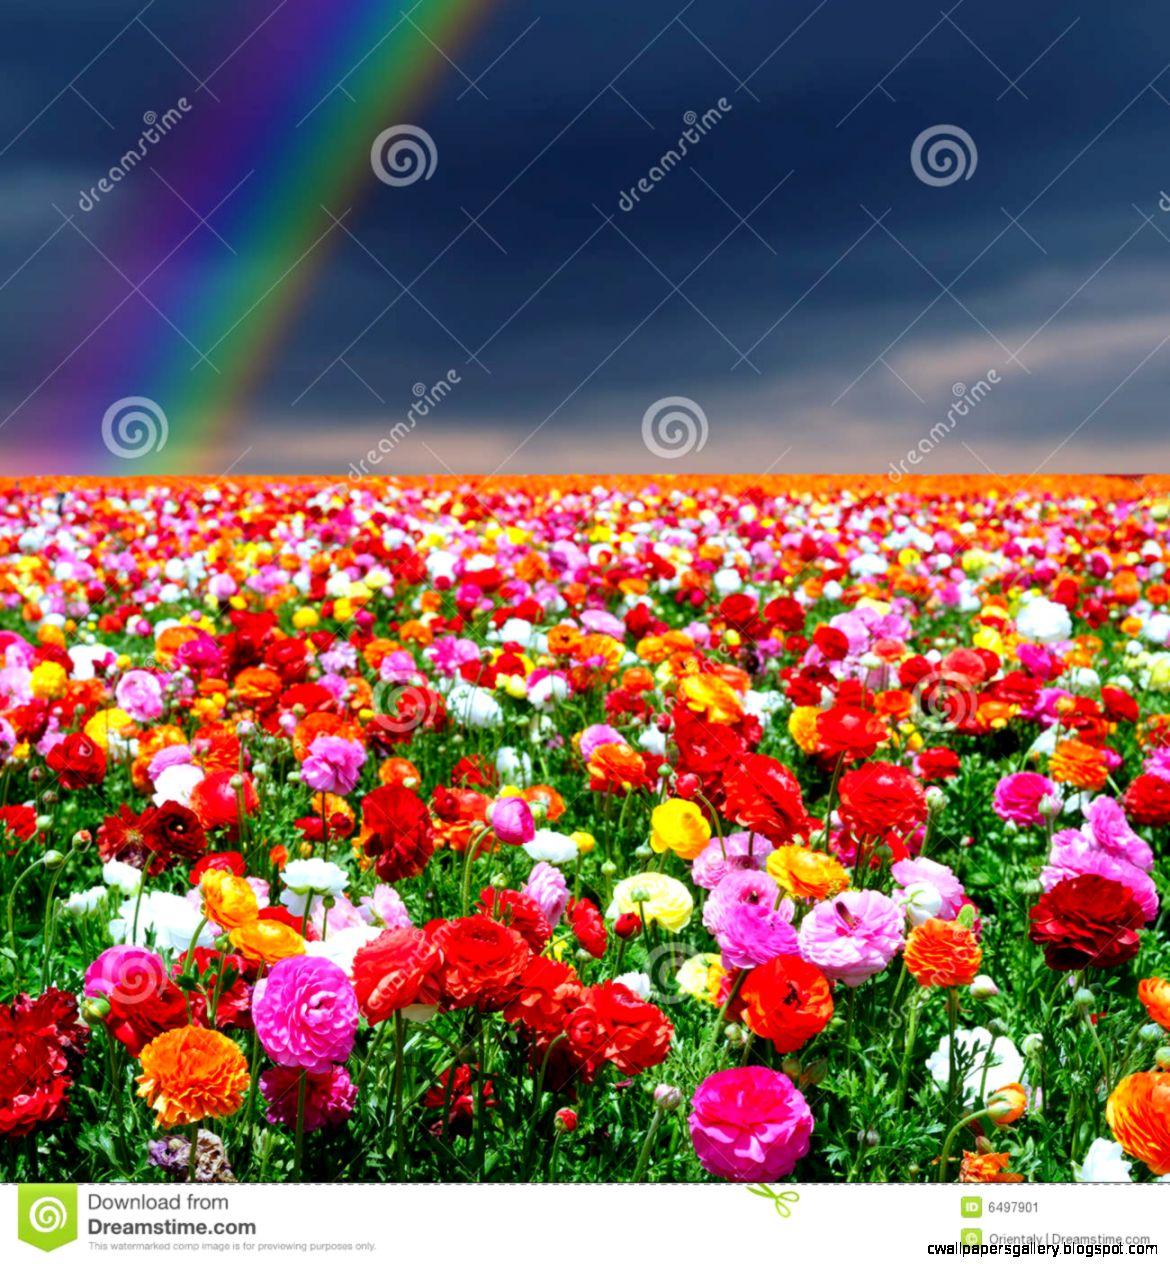 Rainbow And Flowers Background Stock Image   Image 6497901